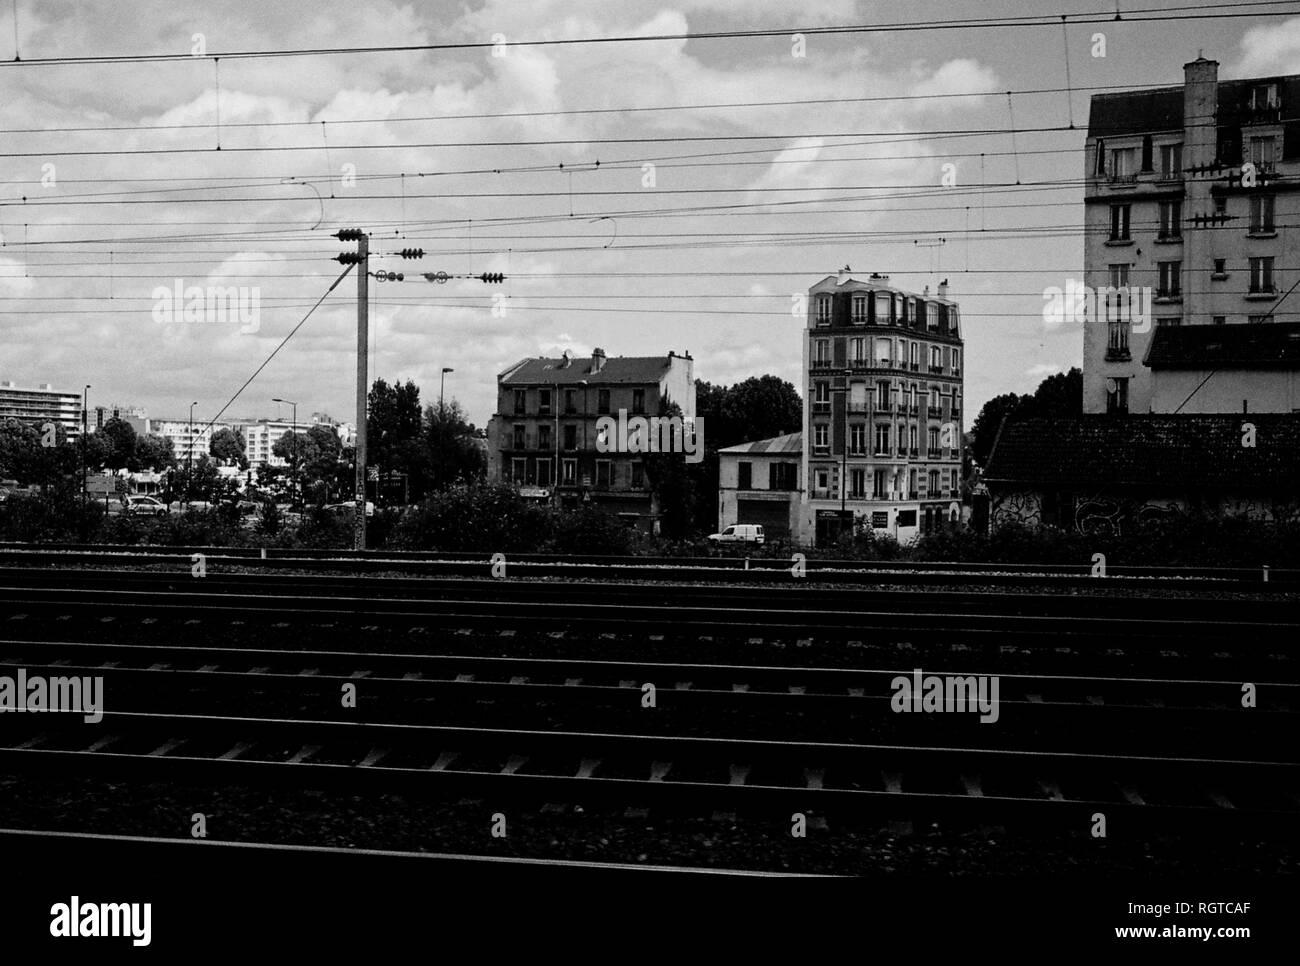 AJAXNETPHOTO. CLICHY, PARIS, FRANCE. - ACROSS THE TRACKS - VIEW LOOKING TOWARD BUILDINGS ON THE D909 NEAR THE QUAI DE CLICHY ACROSS RAIL TRACKS RUNNING FROM ASNIERES TO GARE ST.LAZARE AT CLICHY. PHOTO:JONATHAN EASTLAND/AJAX REF:CD1541_33 - Stock Image